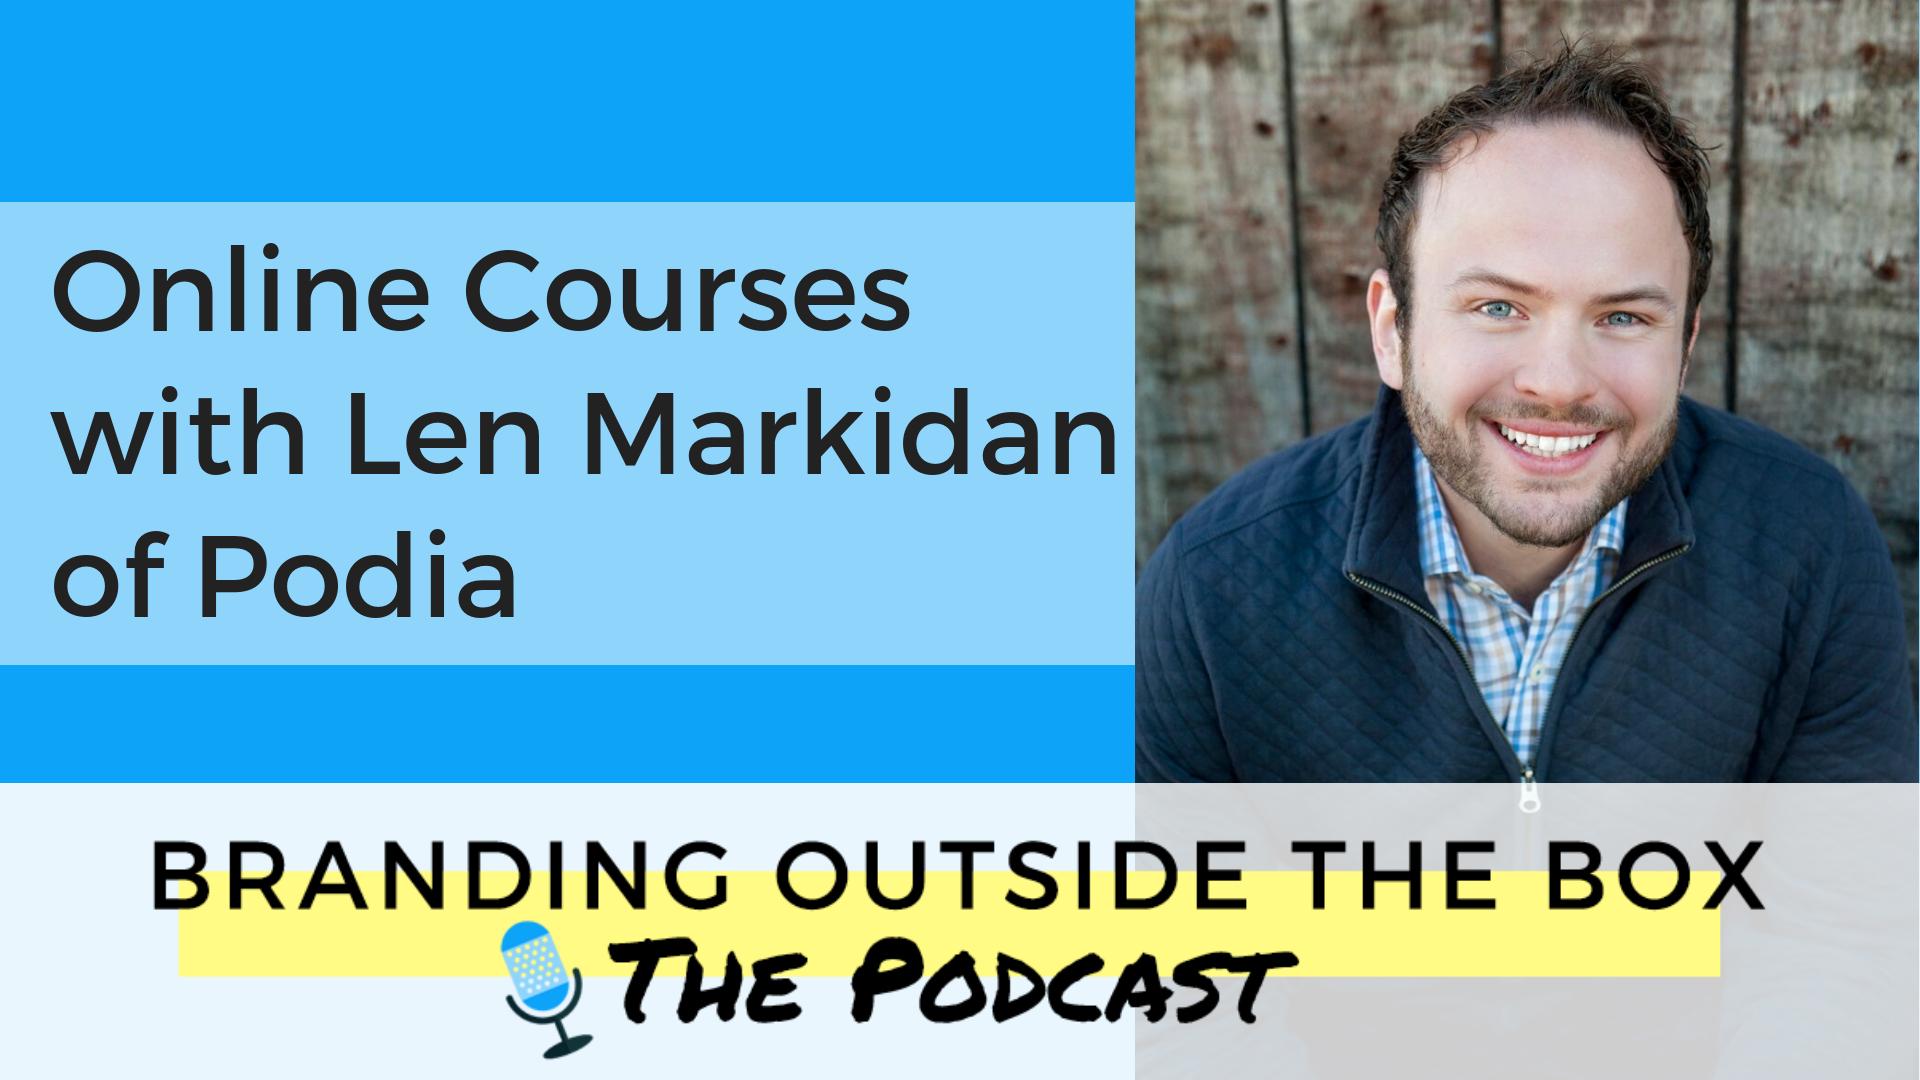 Online Courses with Len Markidan of Podia